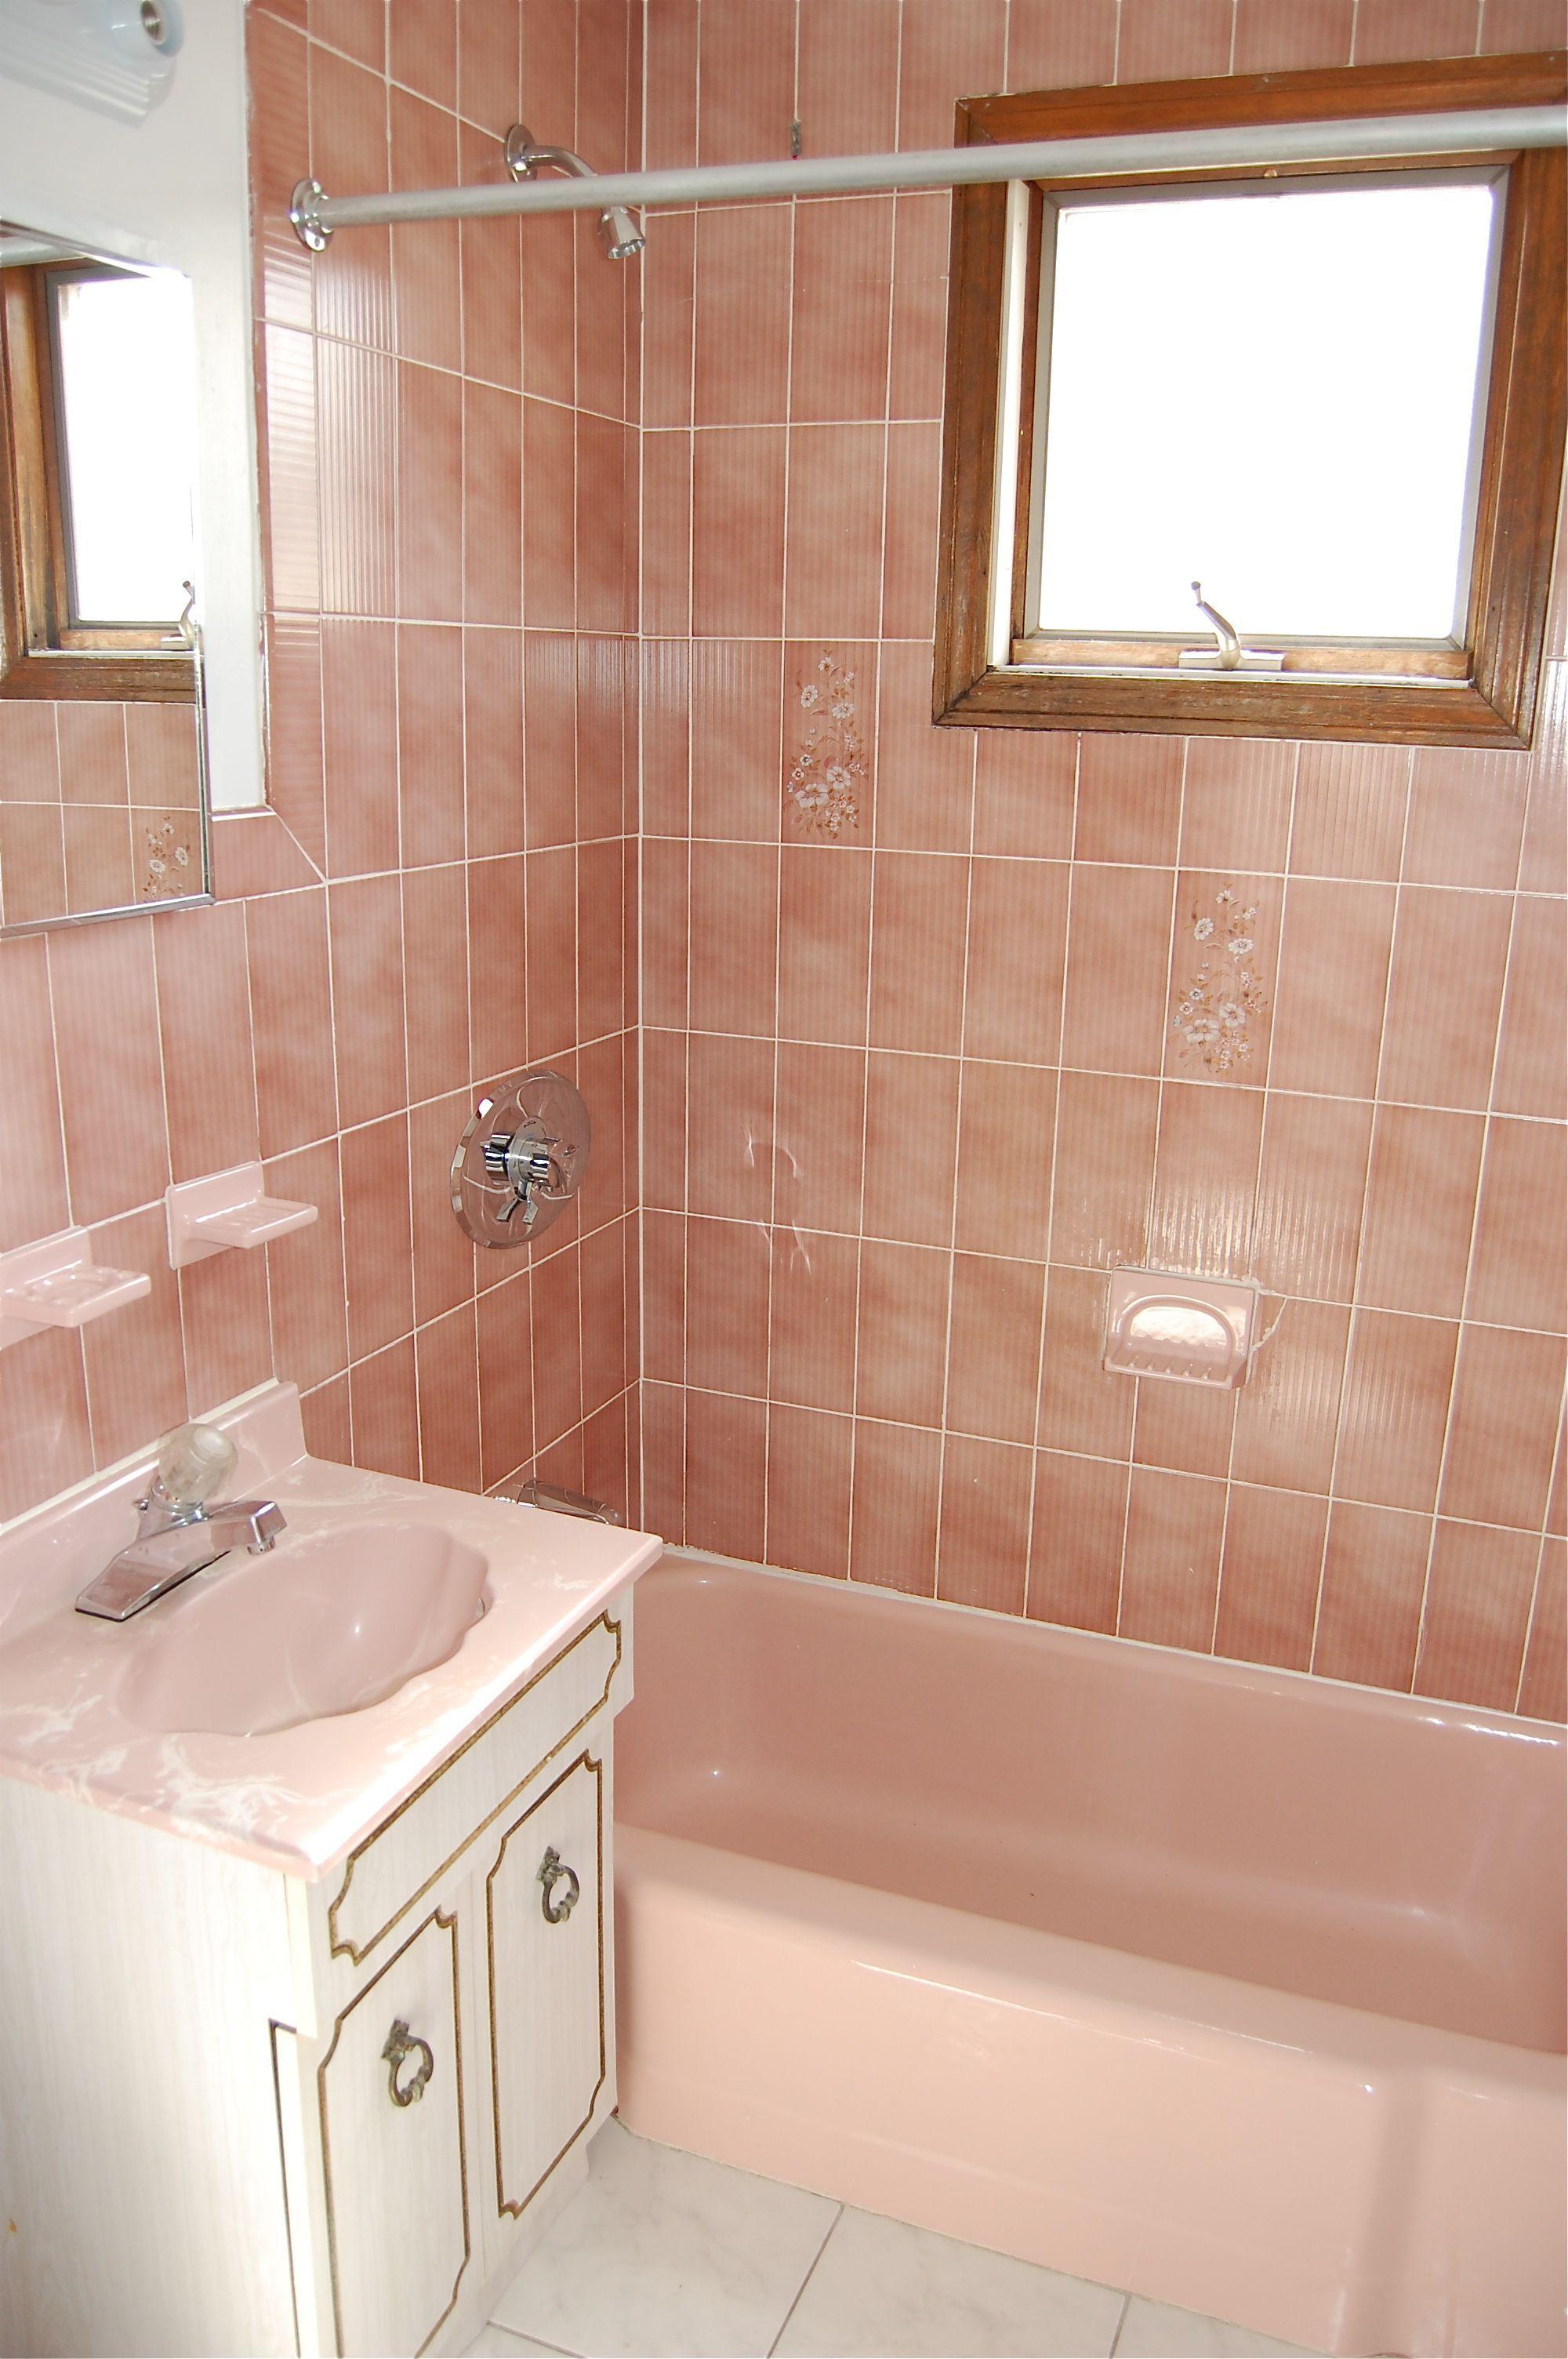 1 Mln Bathroom Tile Ideas Pink Bathroom Tiles Pink Bathroom Tile Bathroom